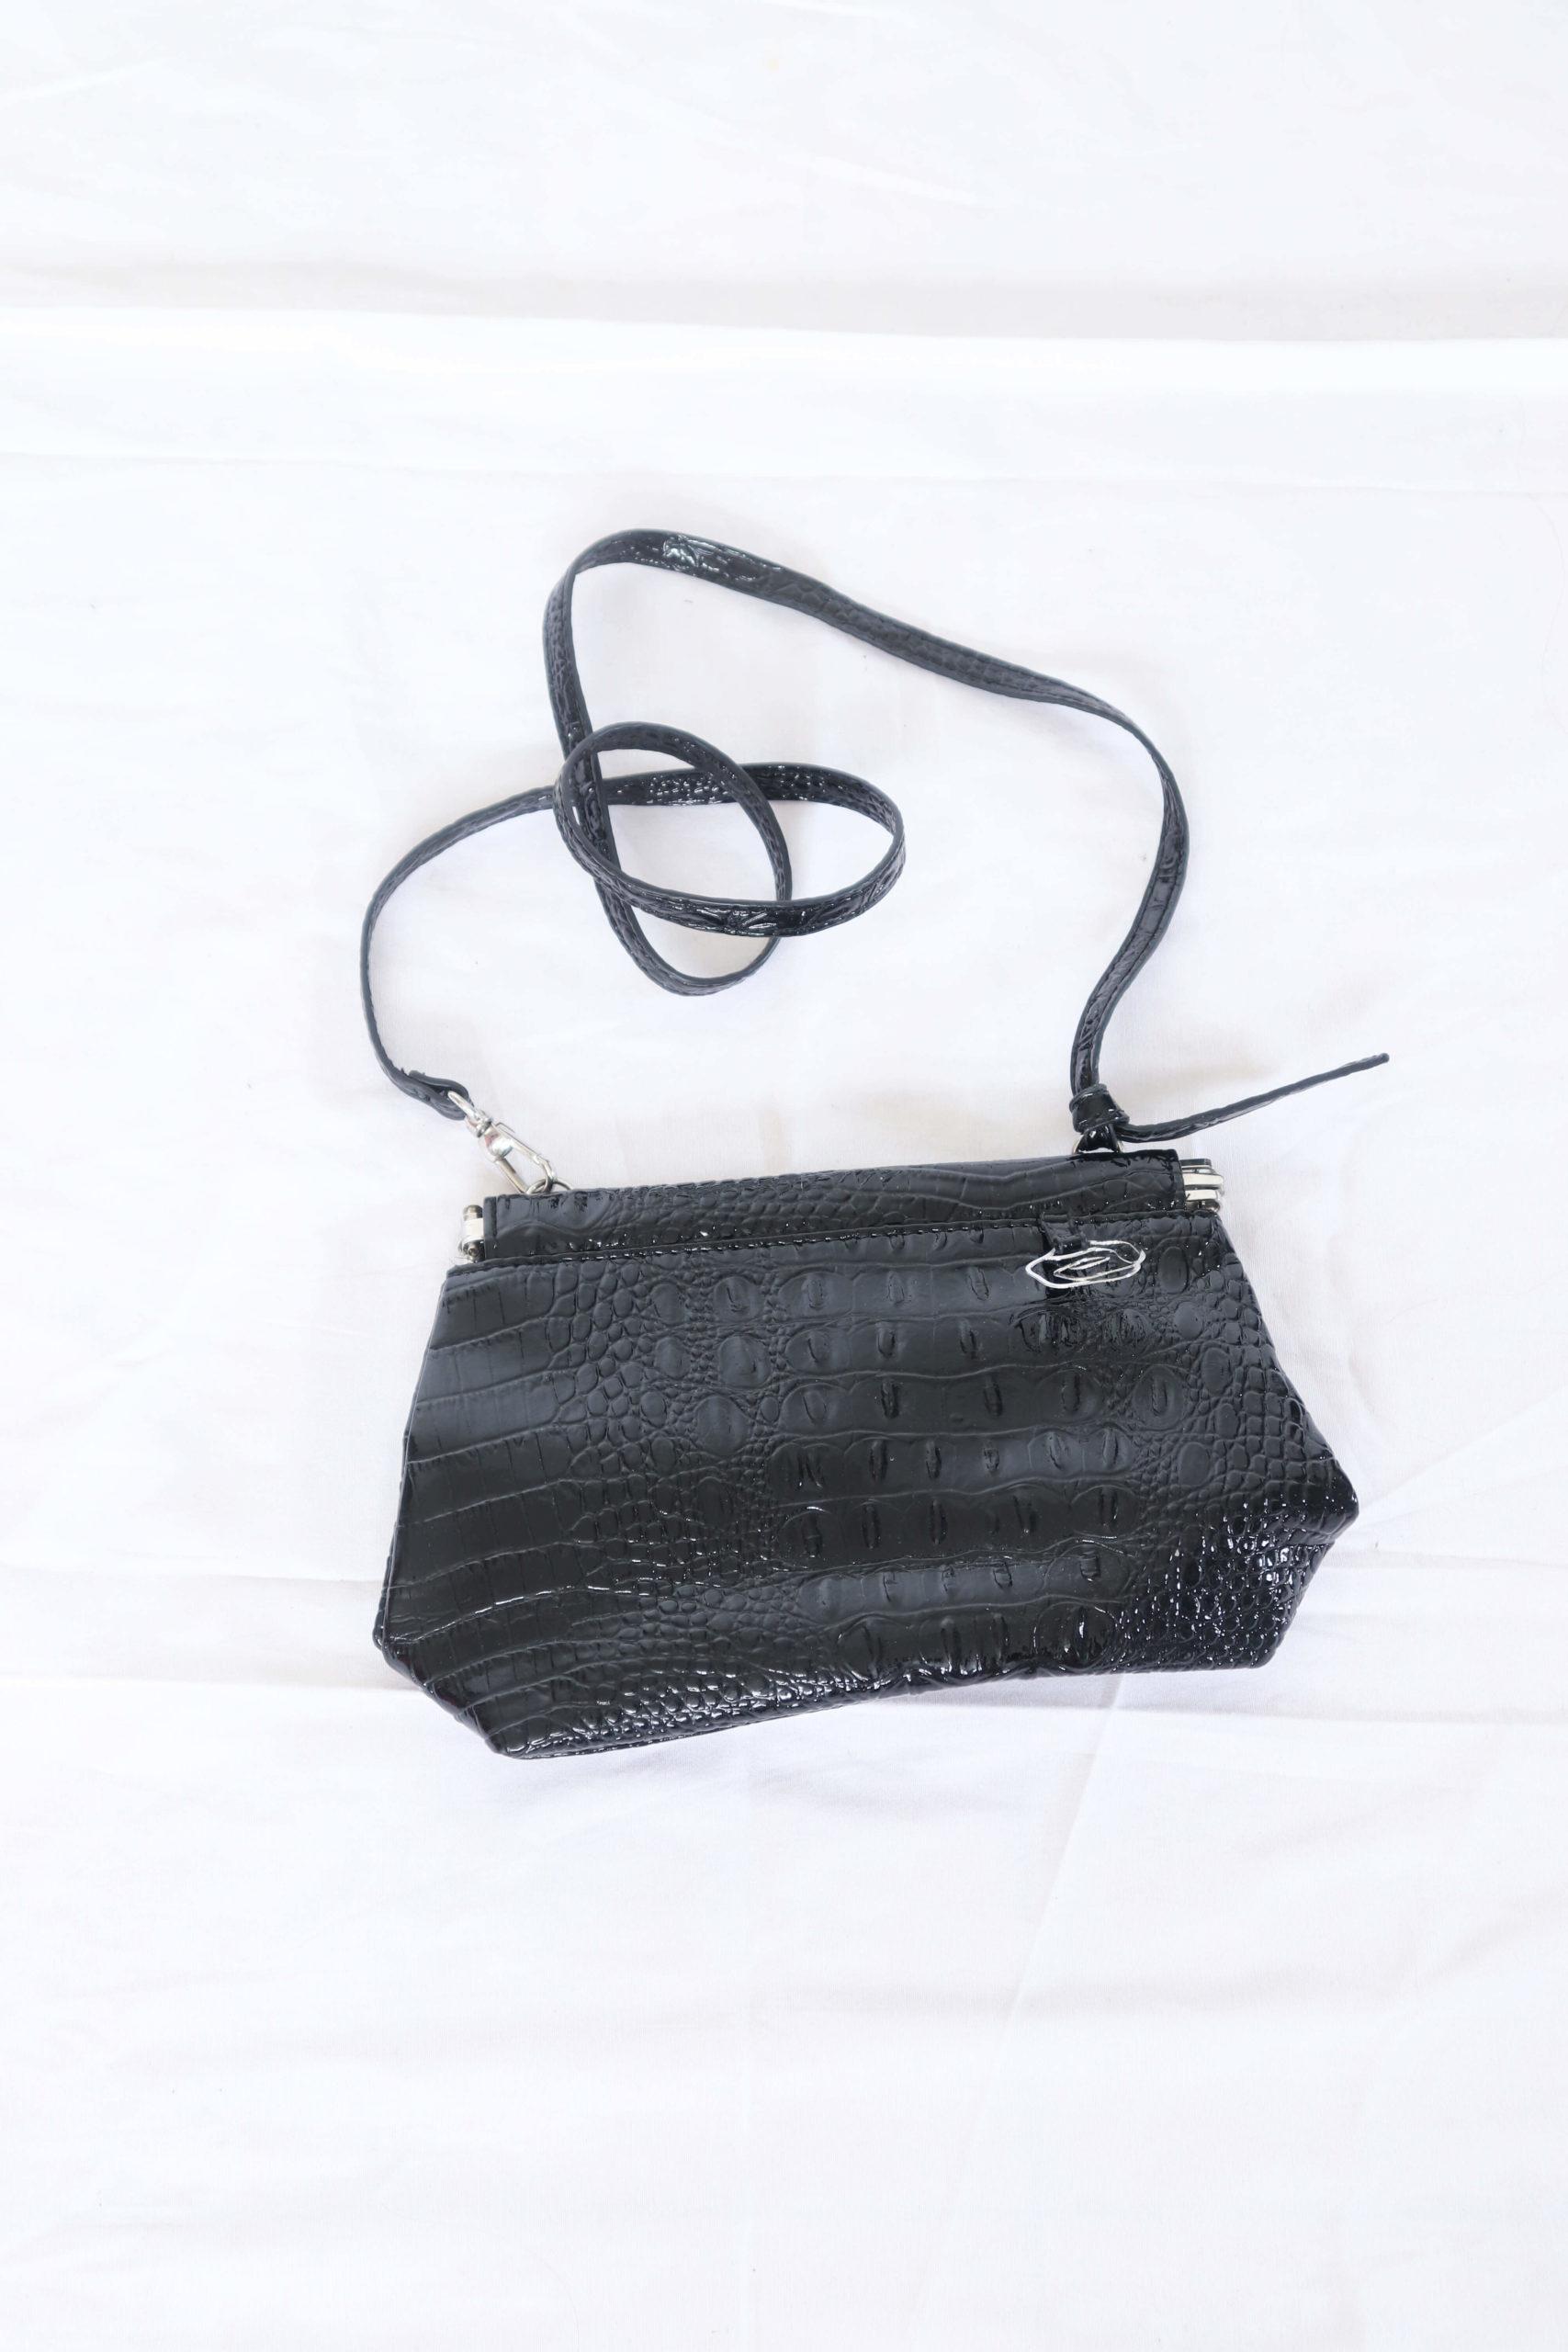 petit sac vintage croco (1)